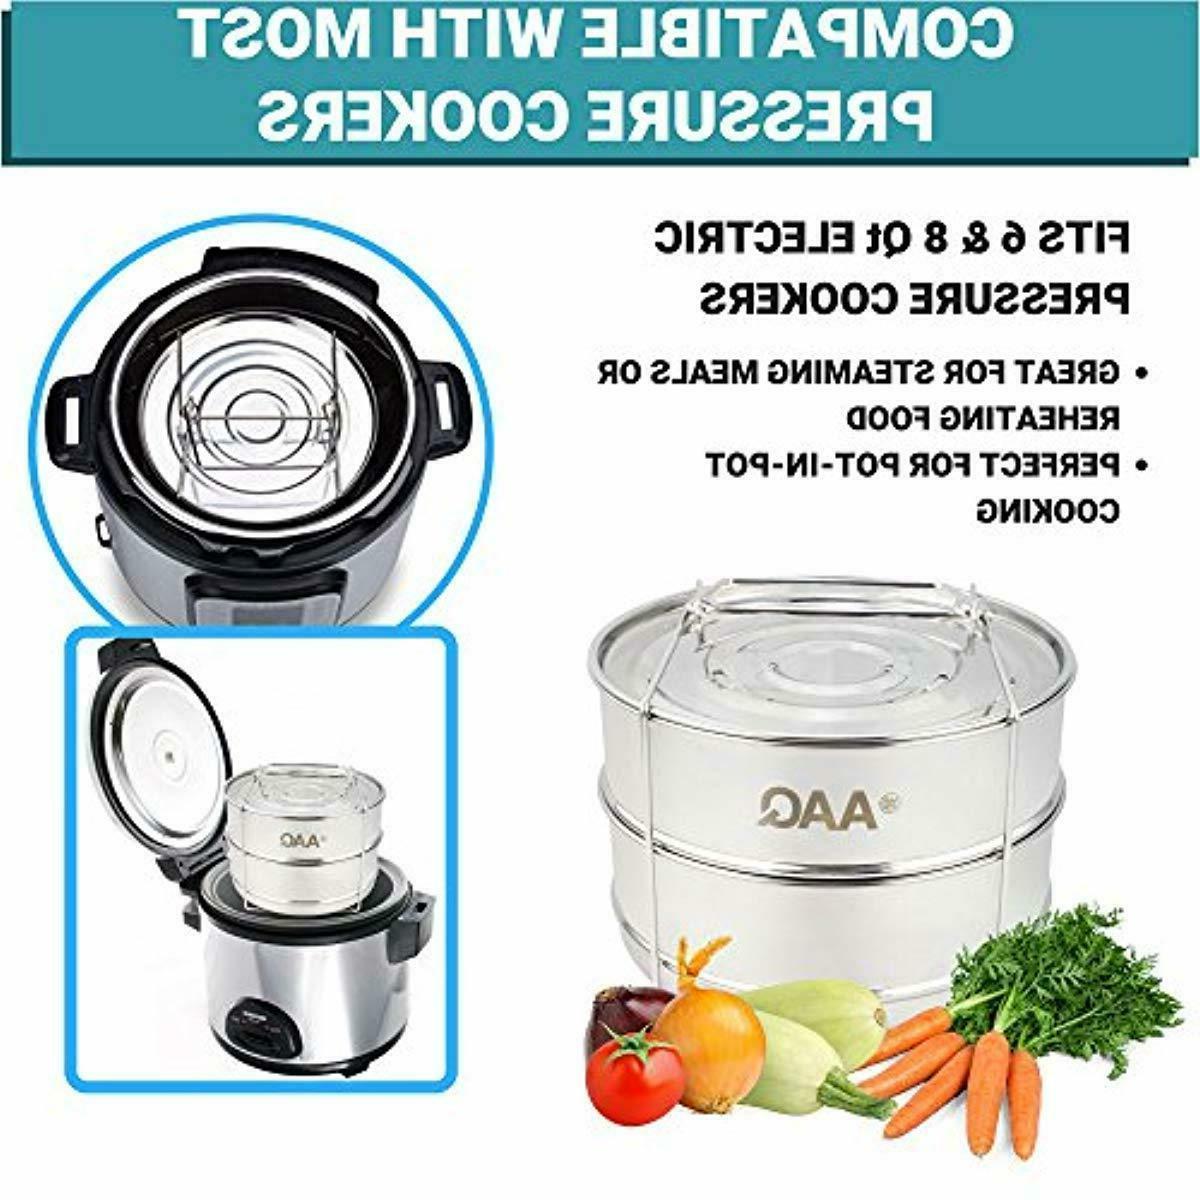 Stackable Steamer Pot Instant 8 6 Cookers Quart